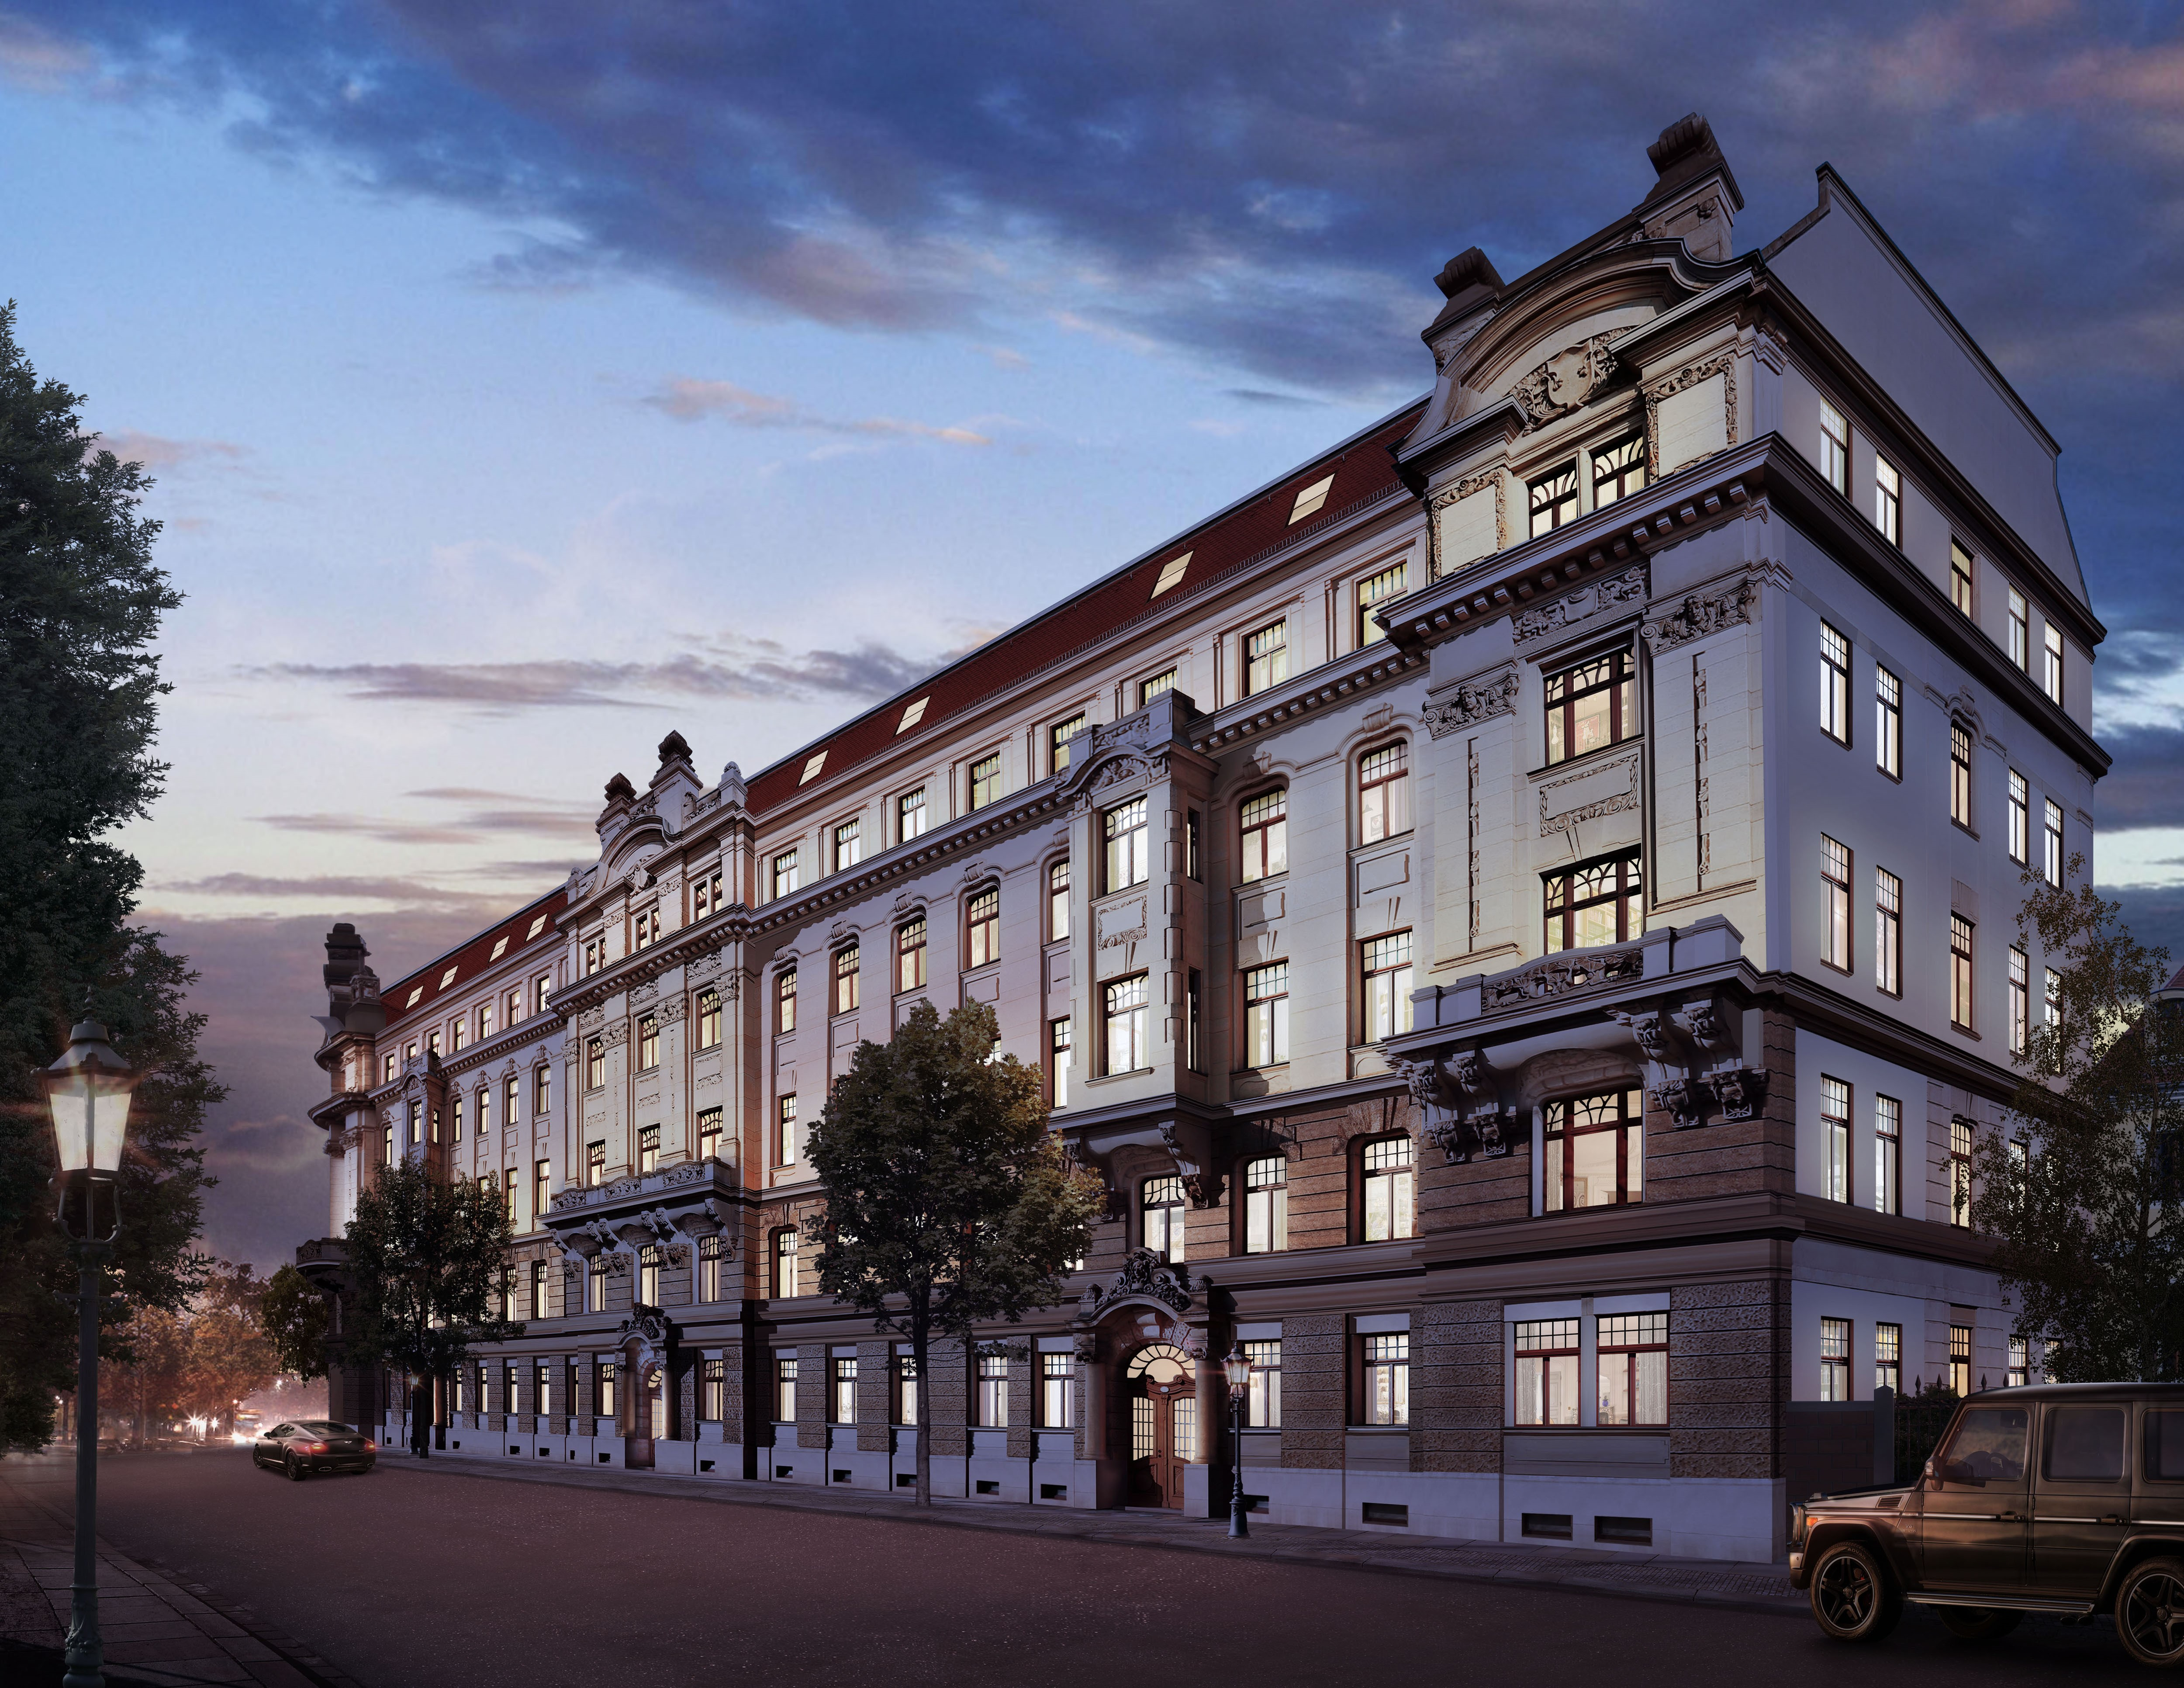 Palatium Dresden - Modernity meets memorial